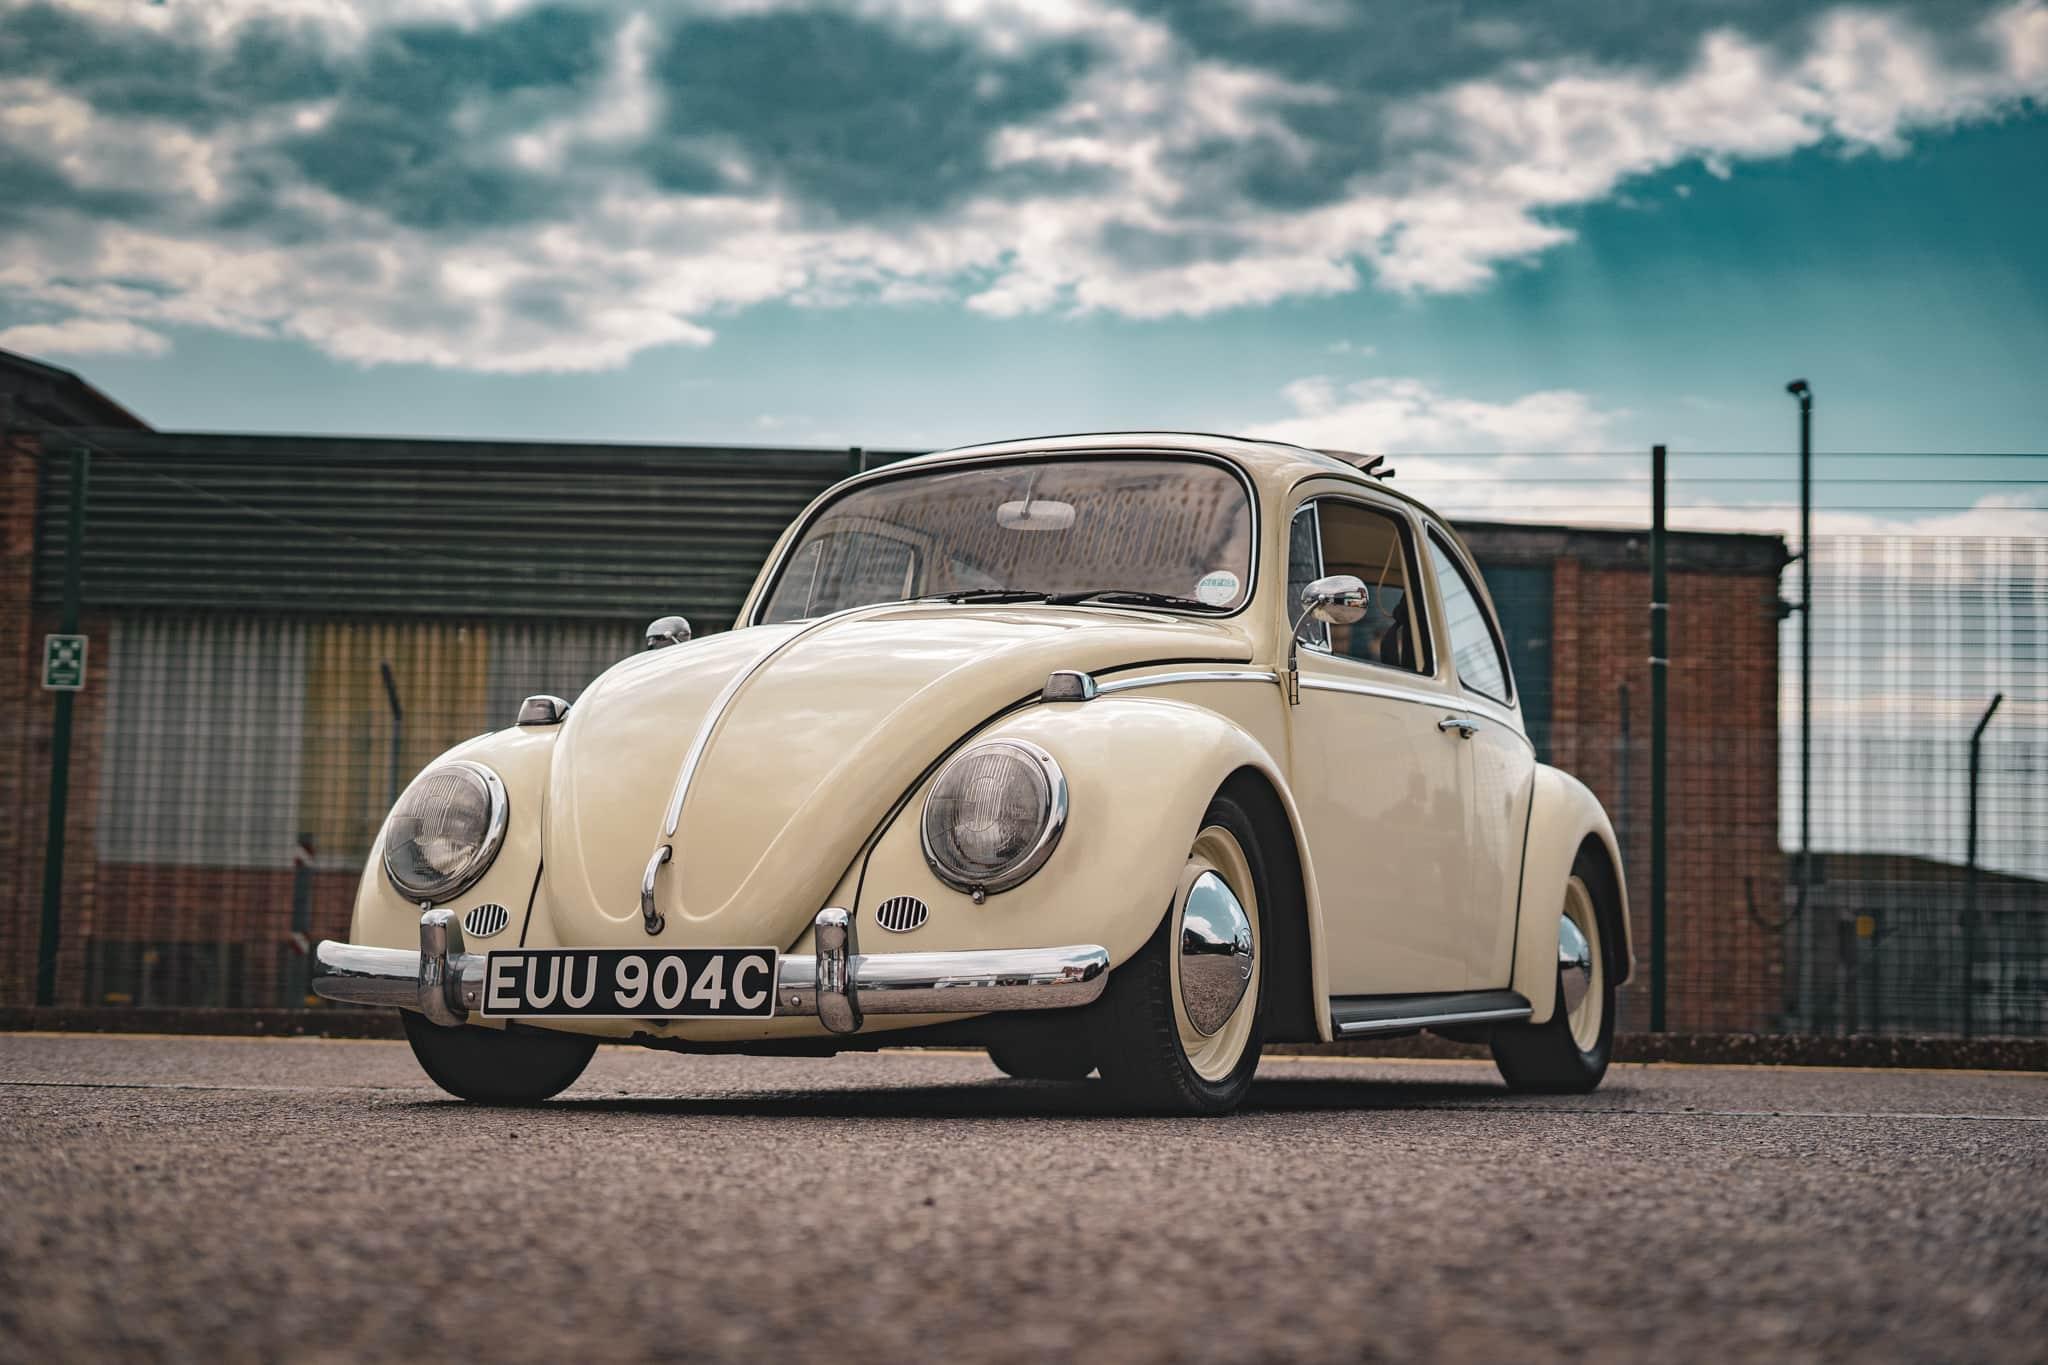 1965 VW Ragtop beetle - FREE ENTRY - Love Bug - 9th Aug